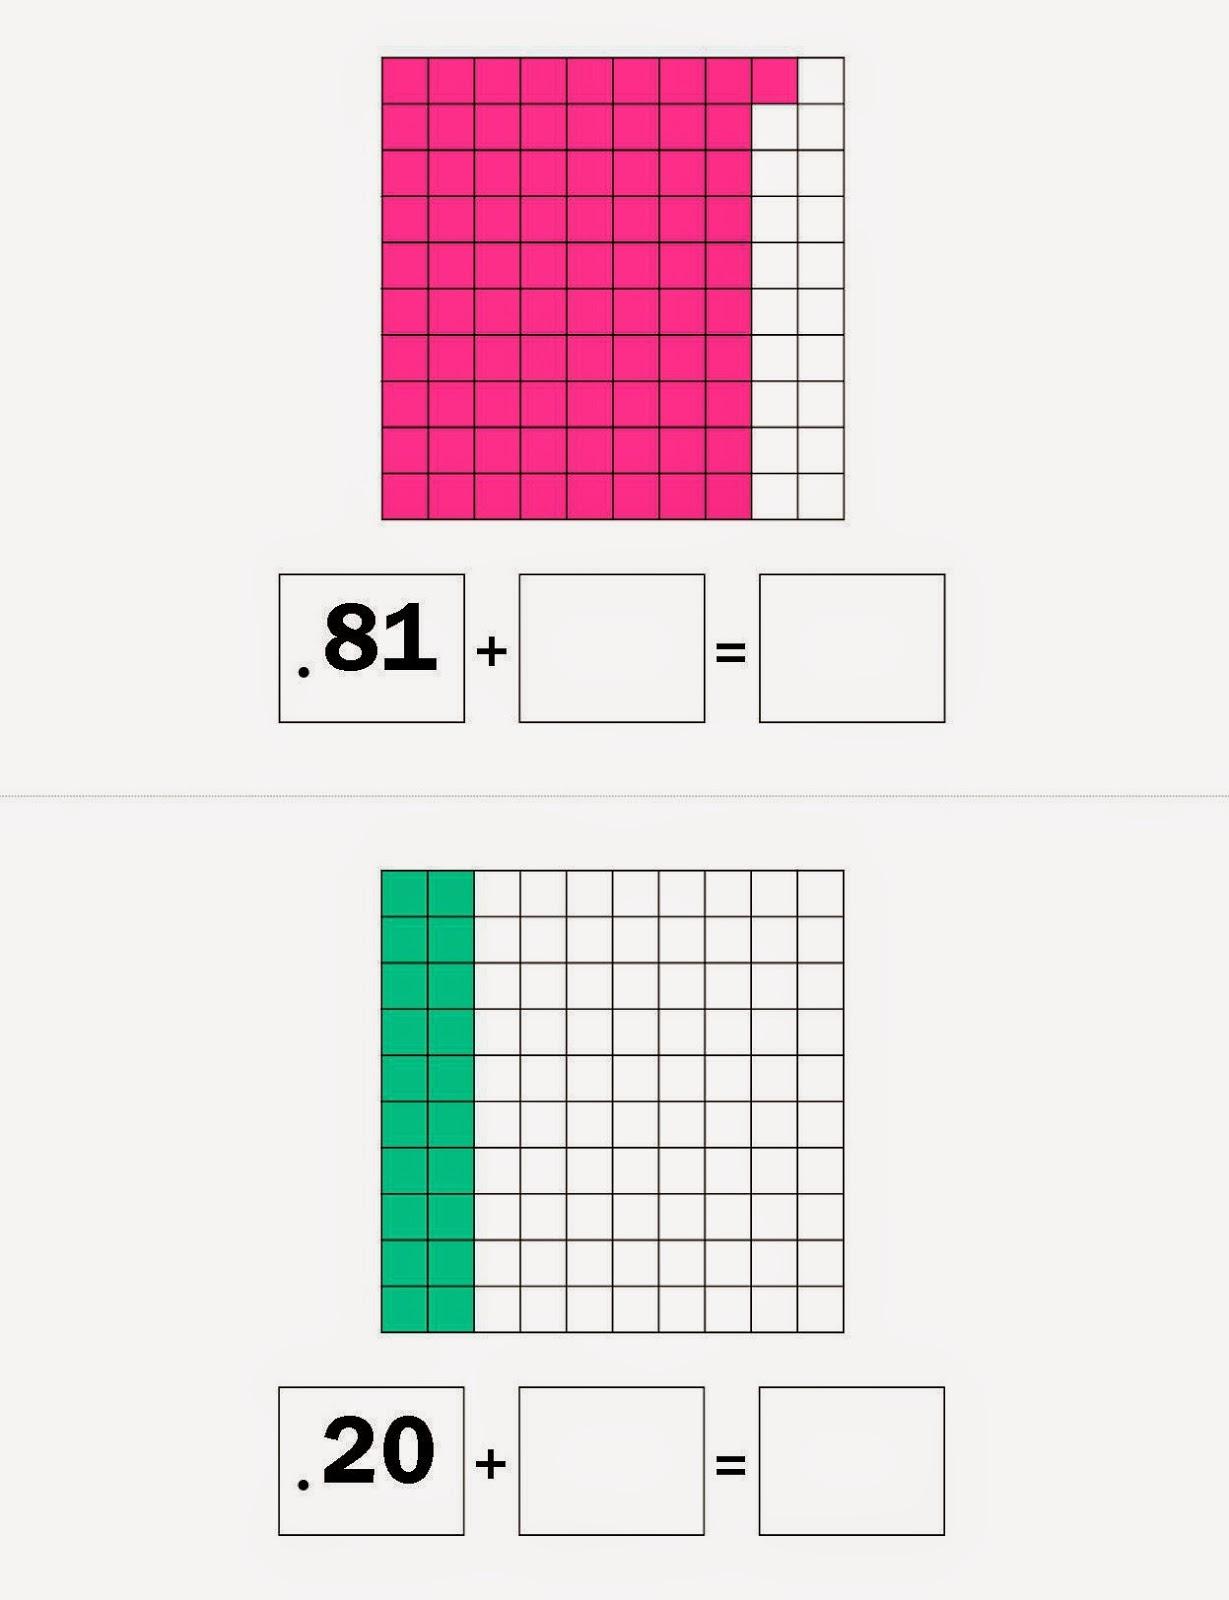 Adding Decimals With A Visual Model